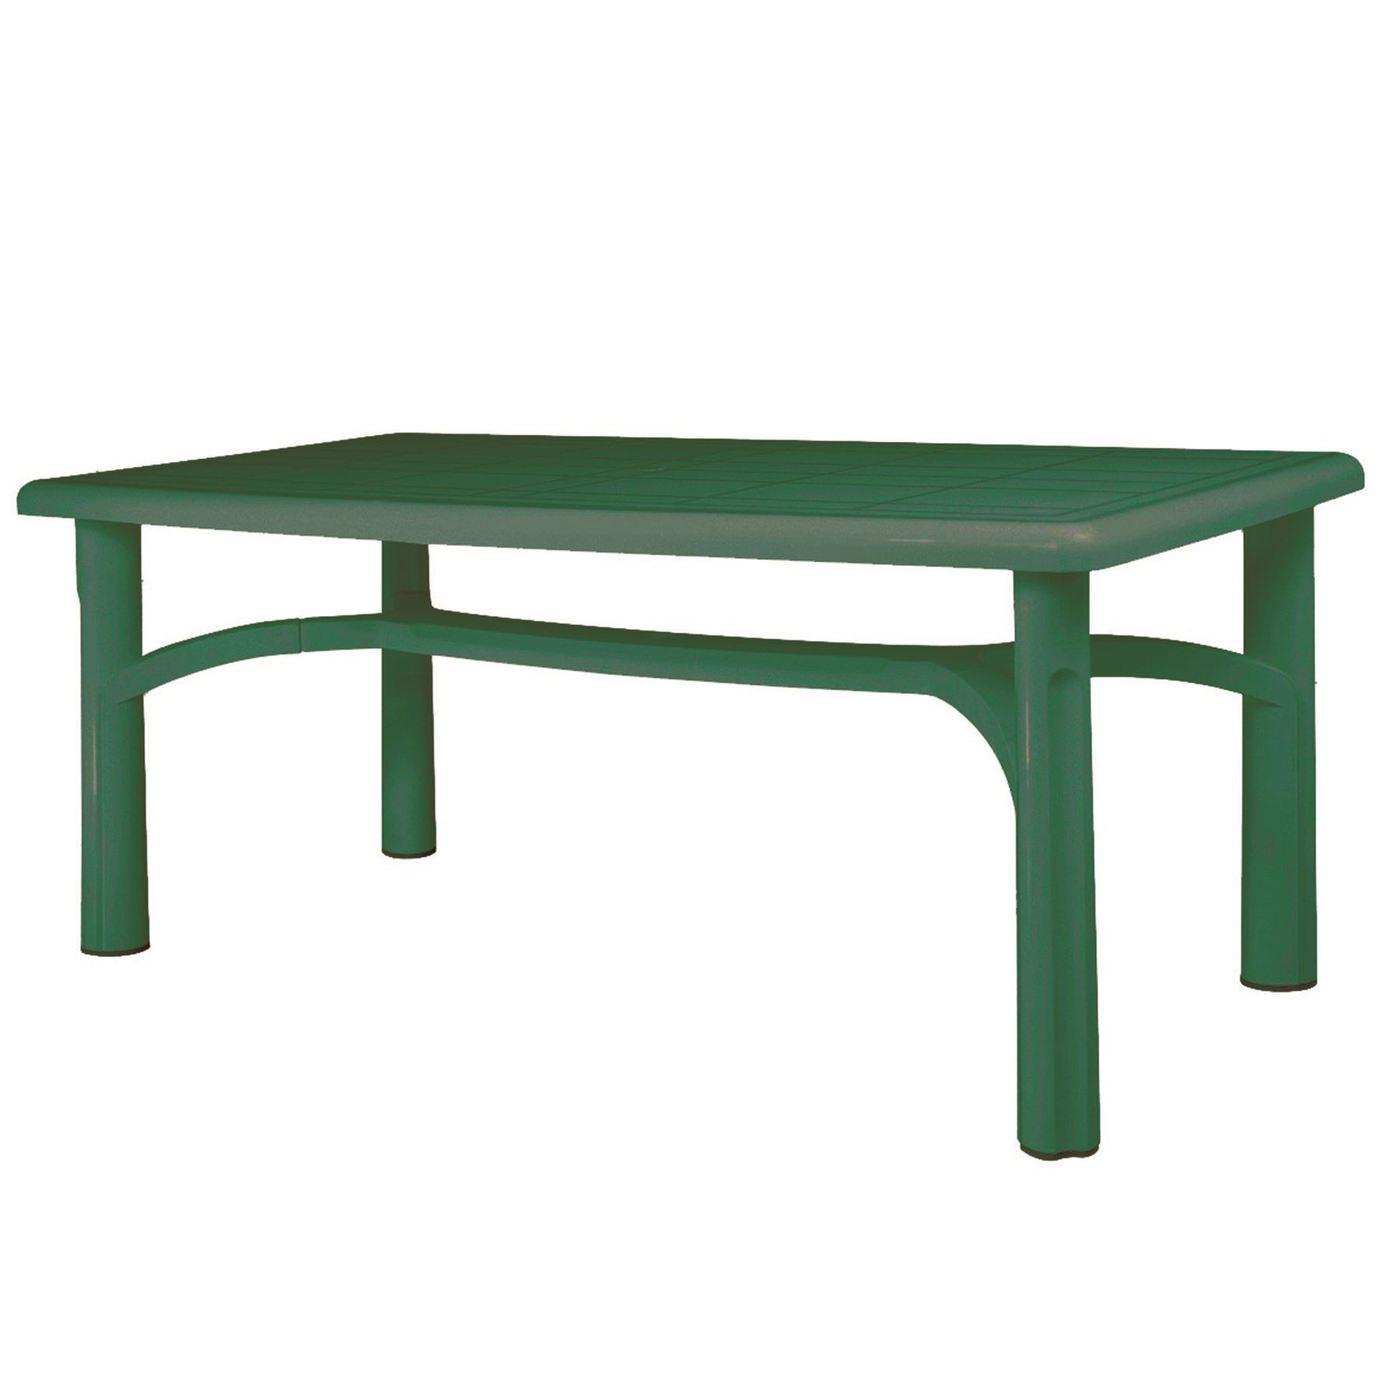 plastic garden table resol vals 180 x 90cm rectangular plastic garden dining table - green UDTMUGR